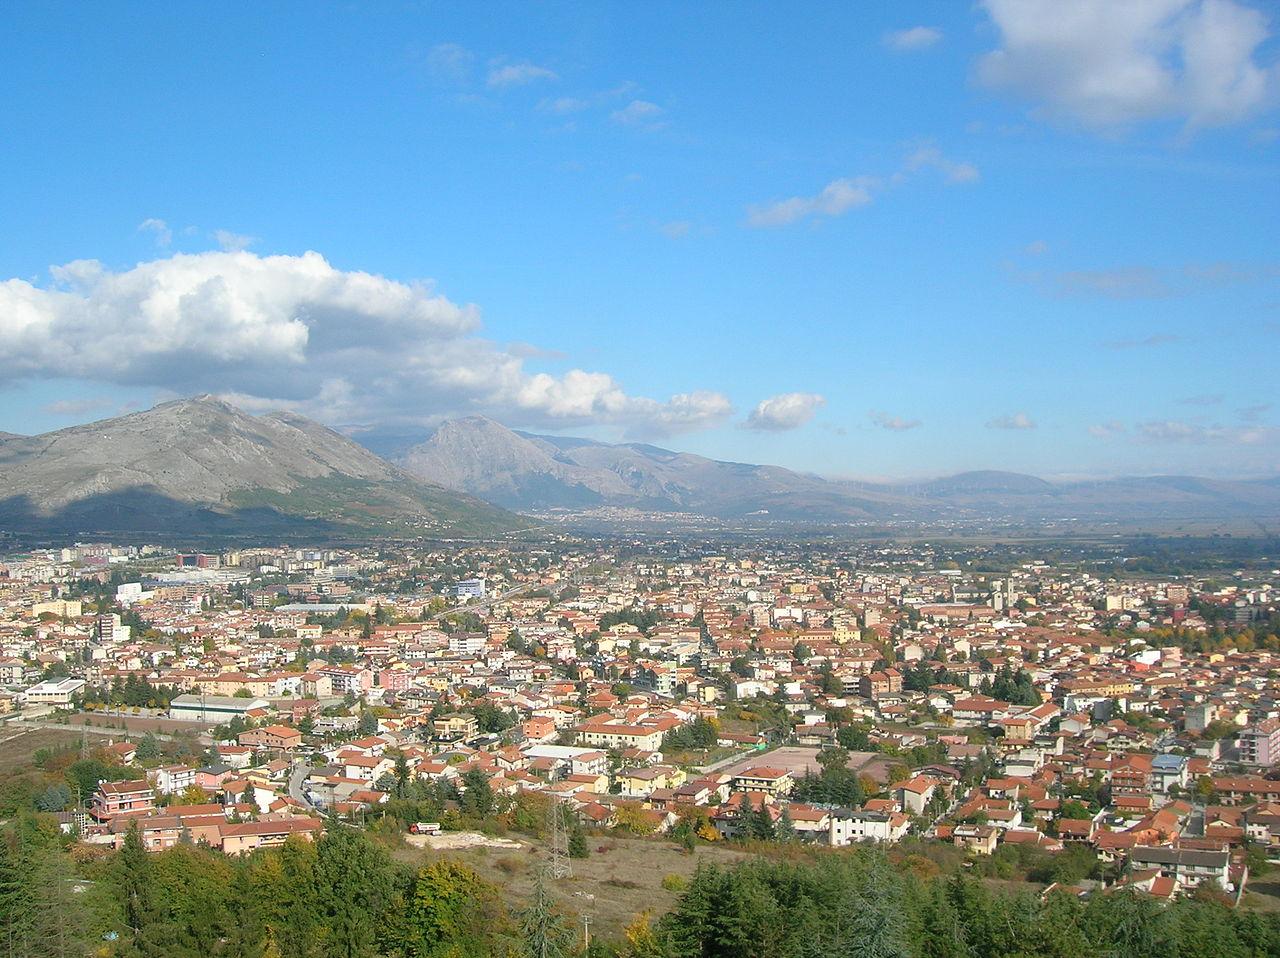 The city of Avezzano